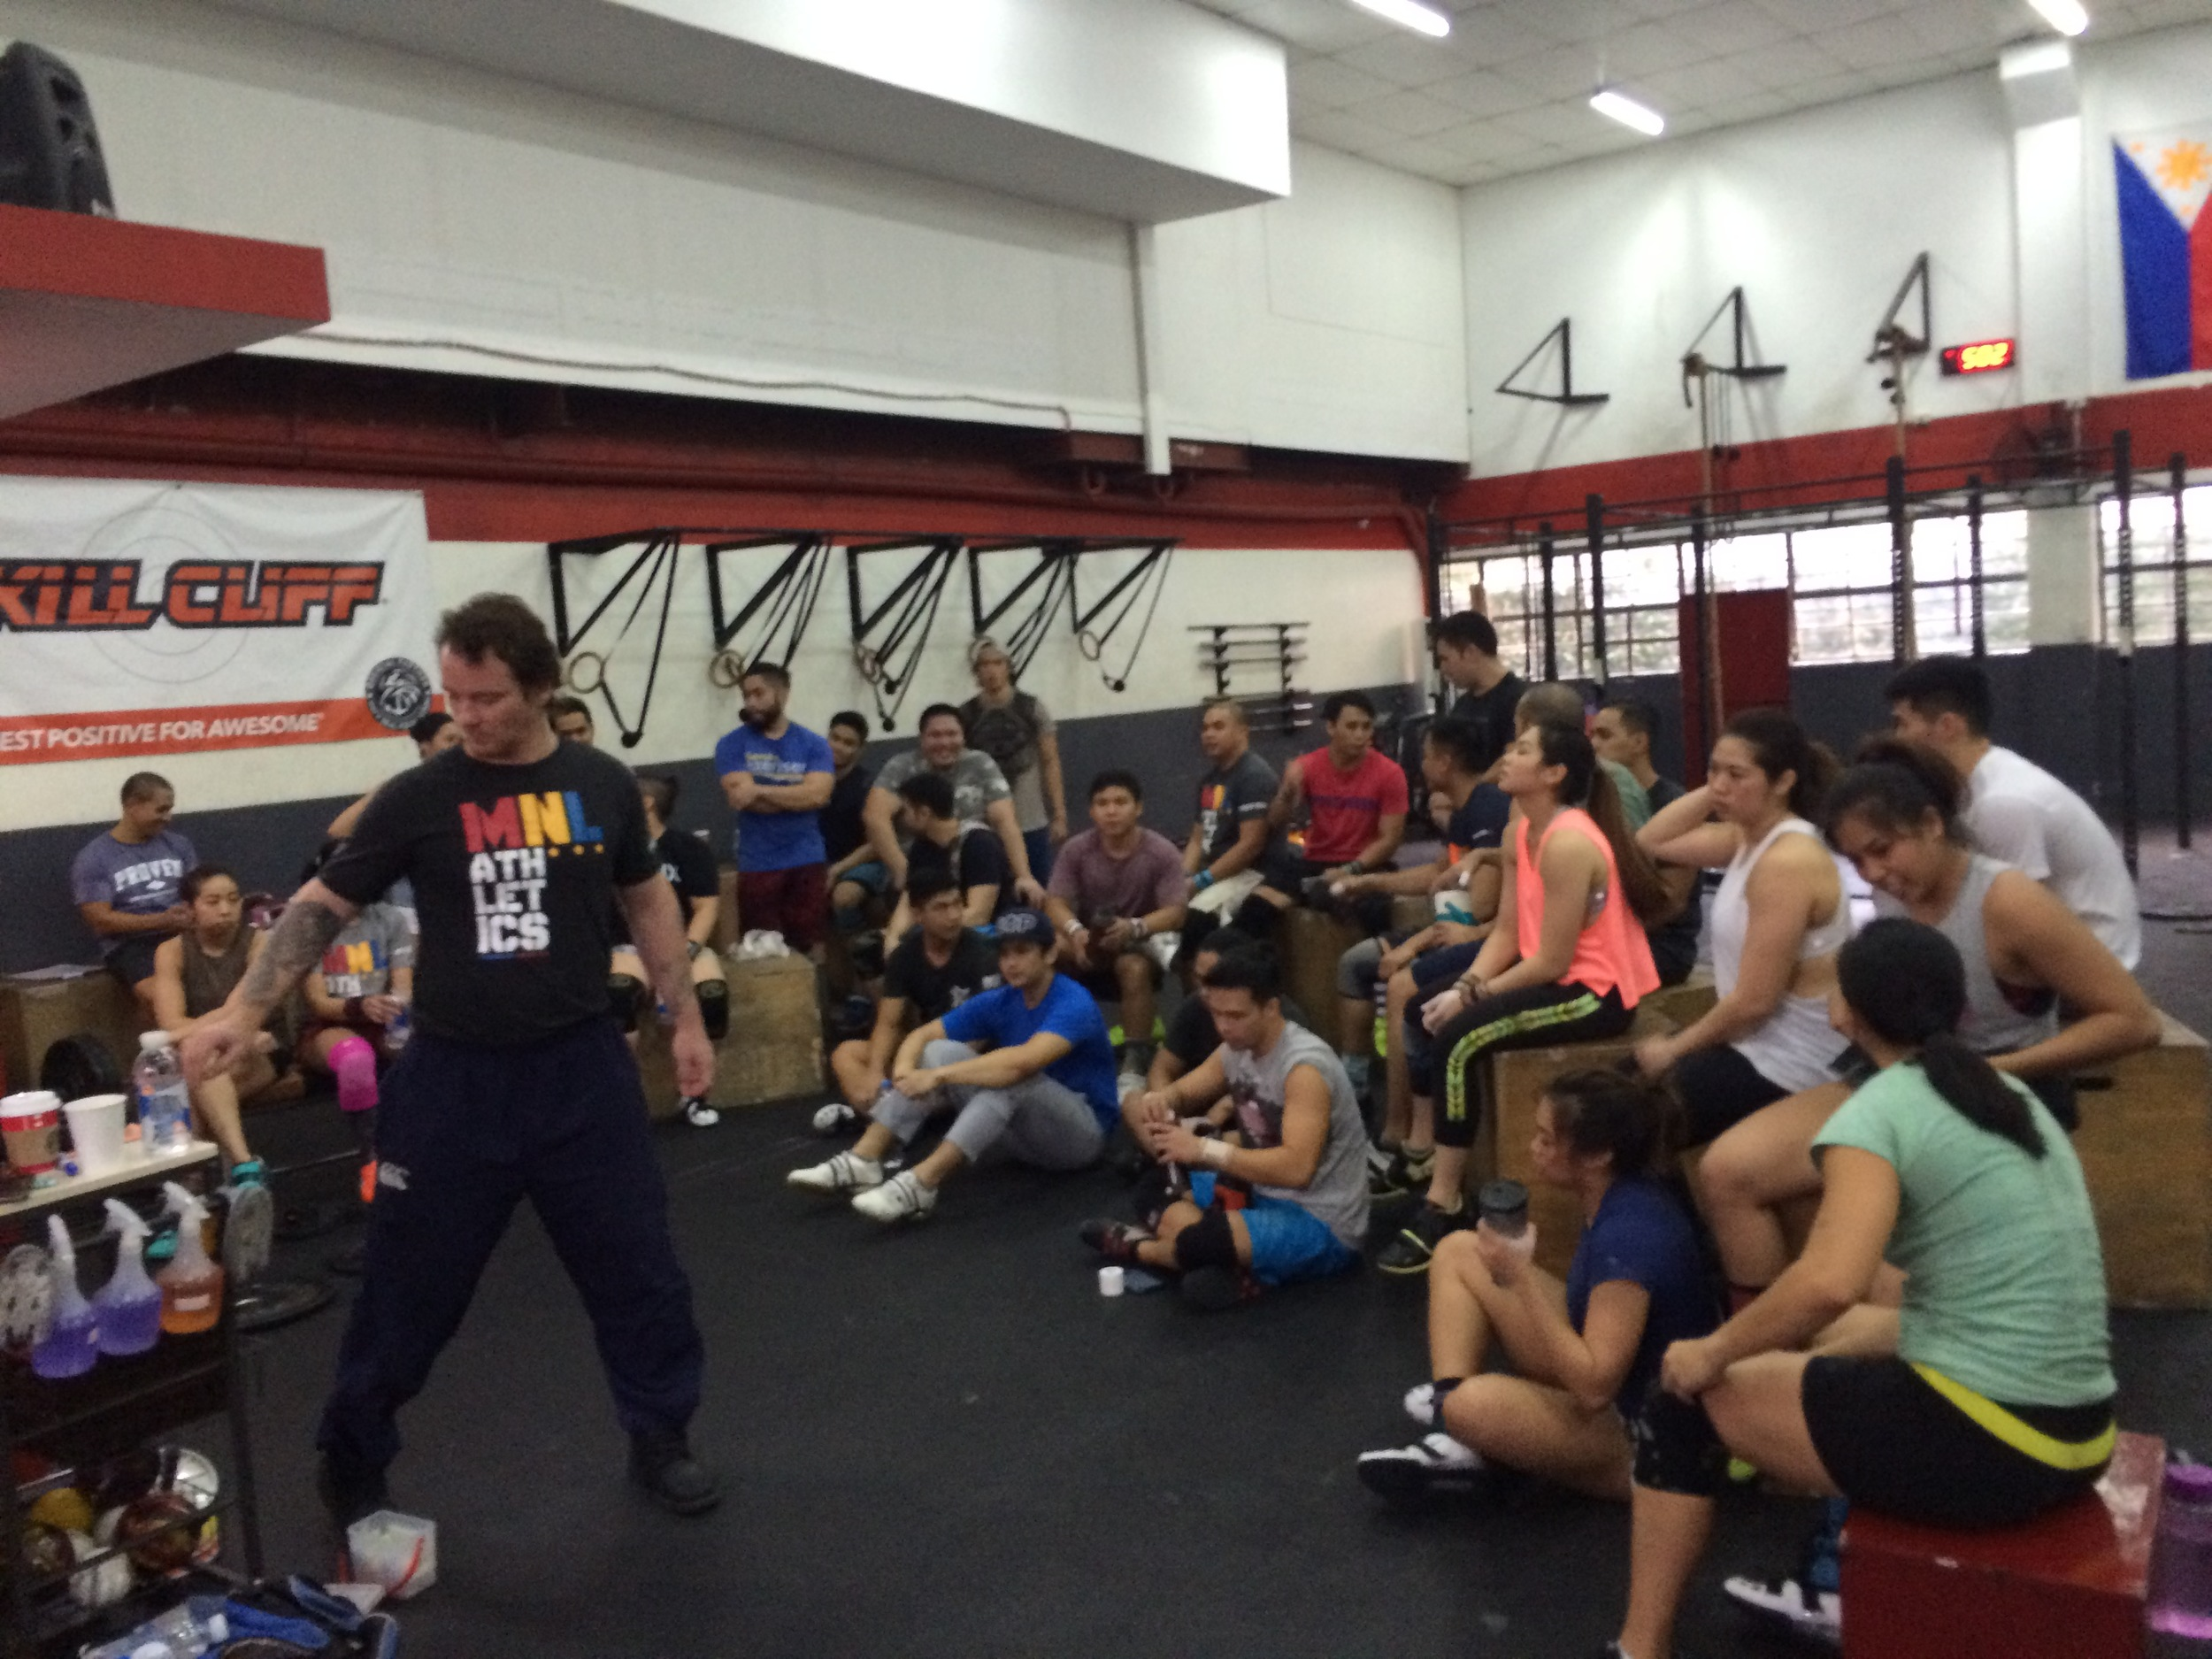 Donny shankle weightlifting seminar